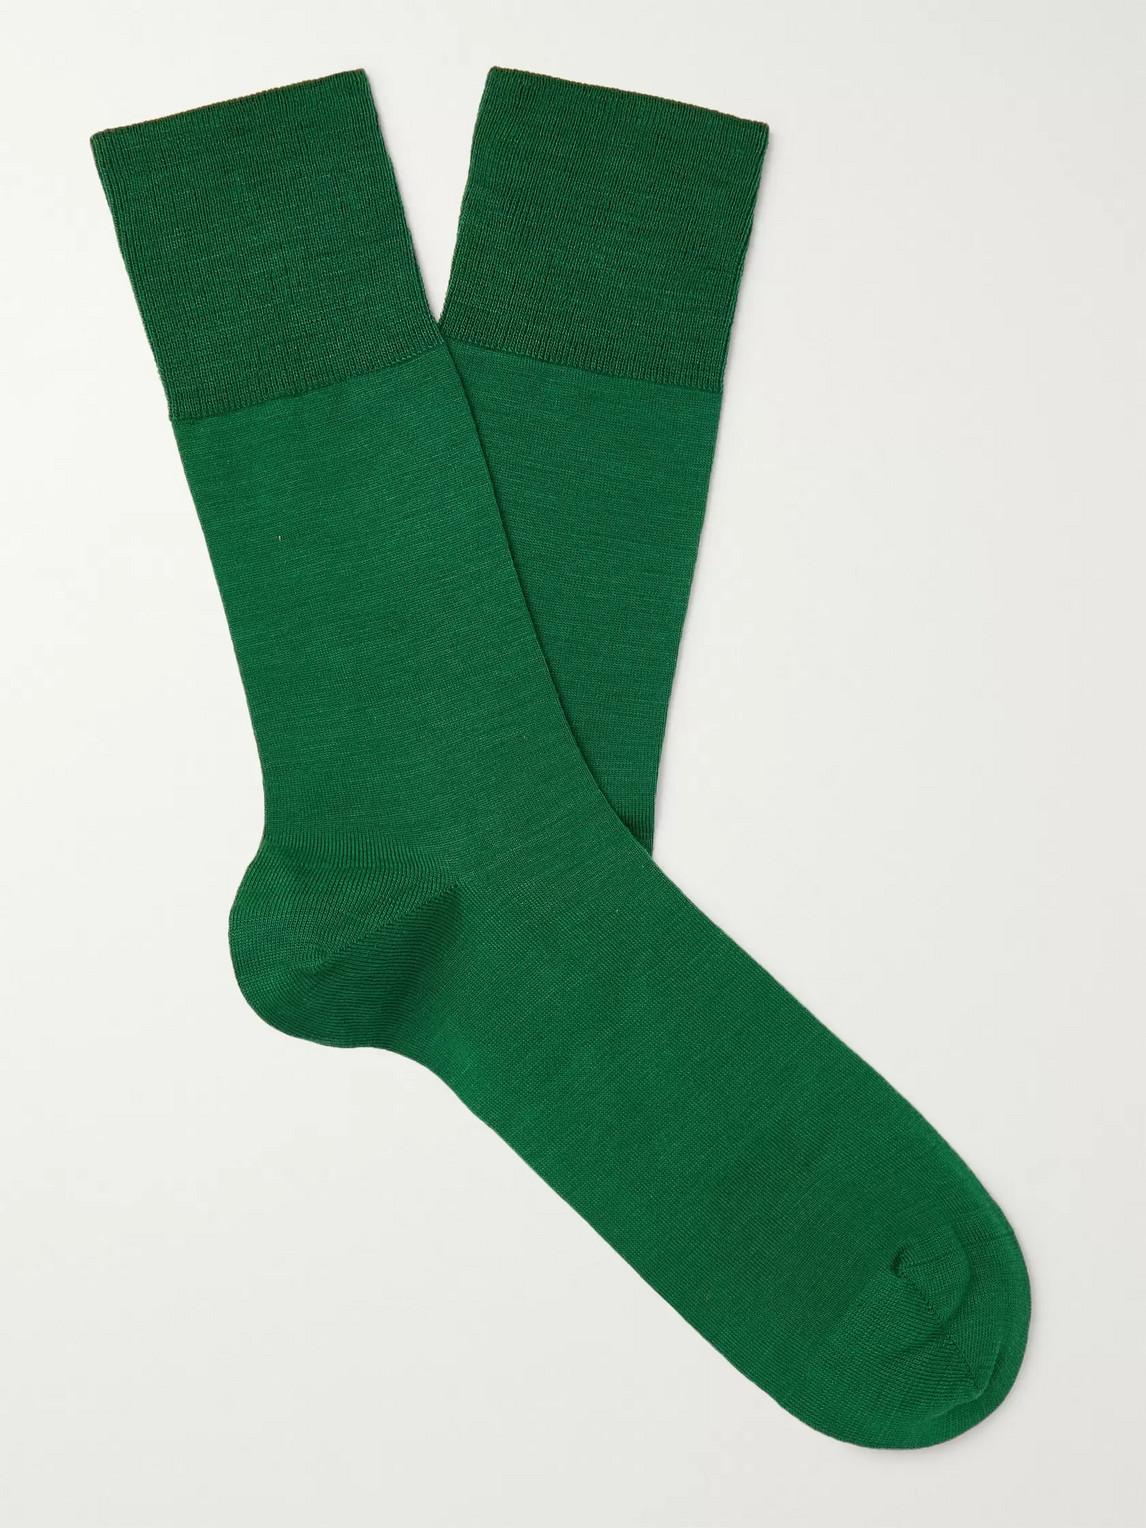 falke - airport city virgin wool-blend socks - men - green